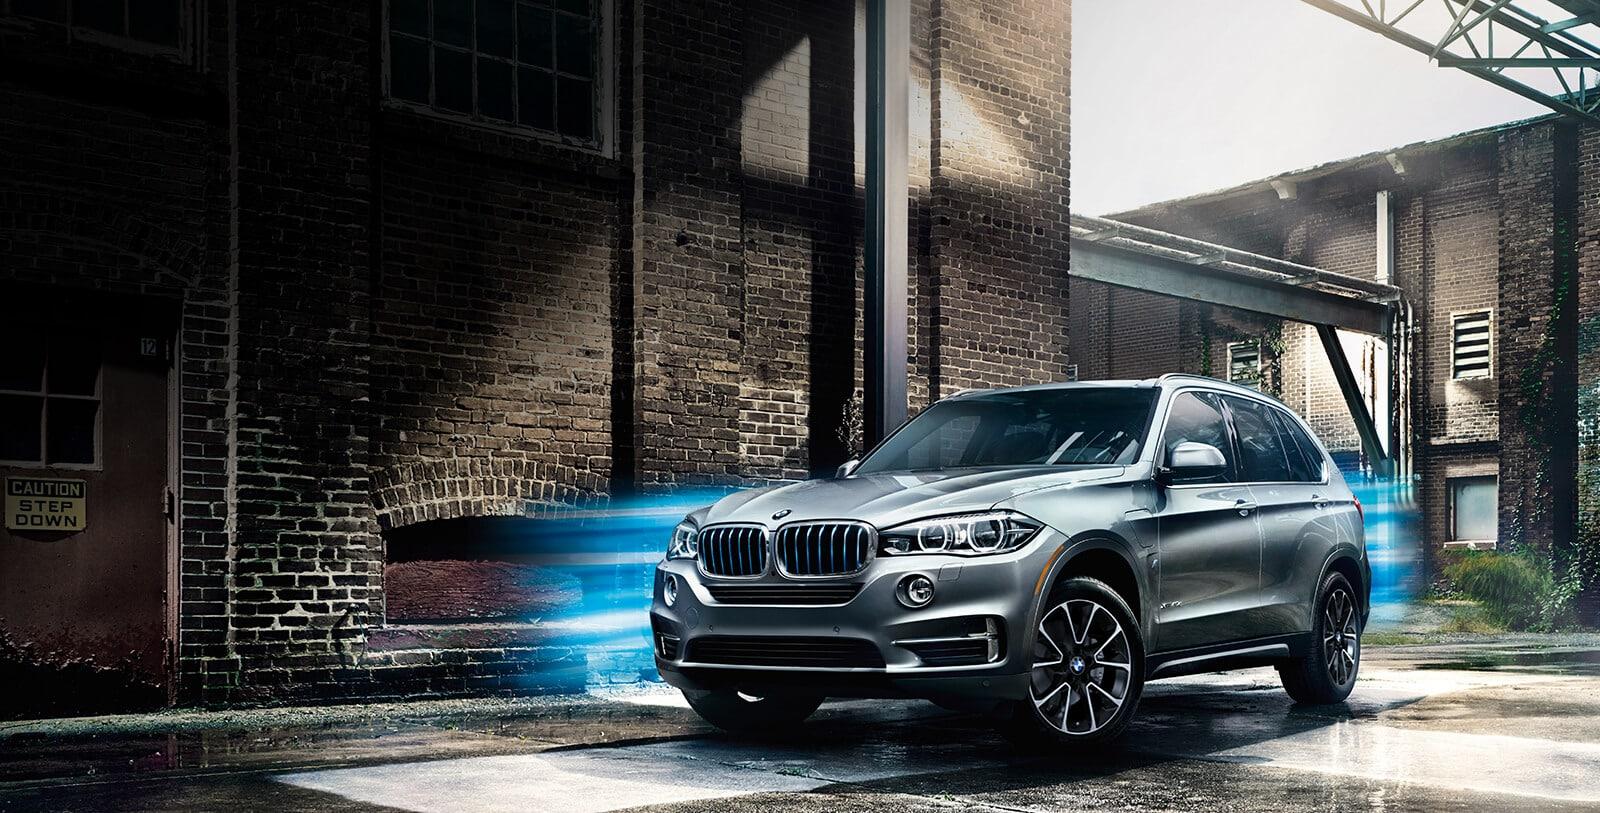 2018 BMW X5 for Sale near Arlington, TX